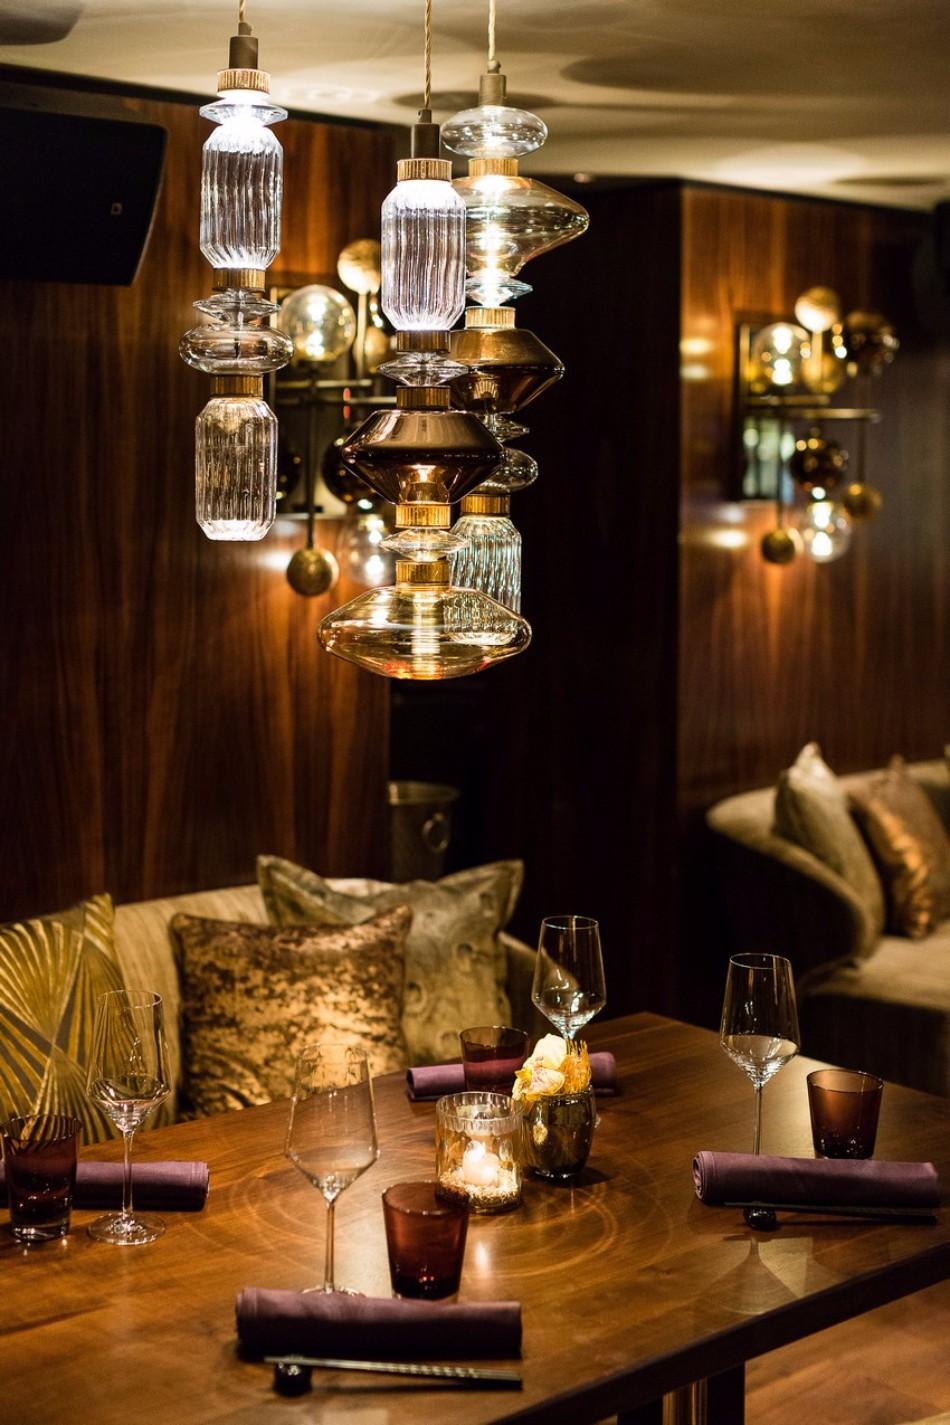 The Stunning Interior Design of the Luxury Restaurant Nikkei Nine | www.bocadolobo.com #interiordesign #homedecorideas #decorations #homedecor #luxurybrands #luxuryrestaurants #exclusivedesign #restaurants #luxury @homedecorideas luxury restaurant The Stunning Interior Design of the Luxury Restaurant Nikkei Nine The Stunning Interior Design of the Luxury Restaurant Nikkei Nine 5